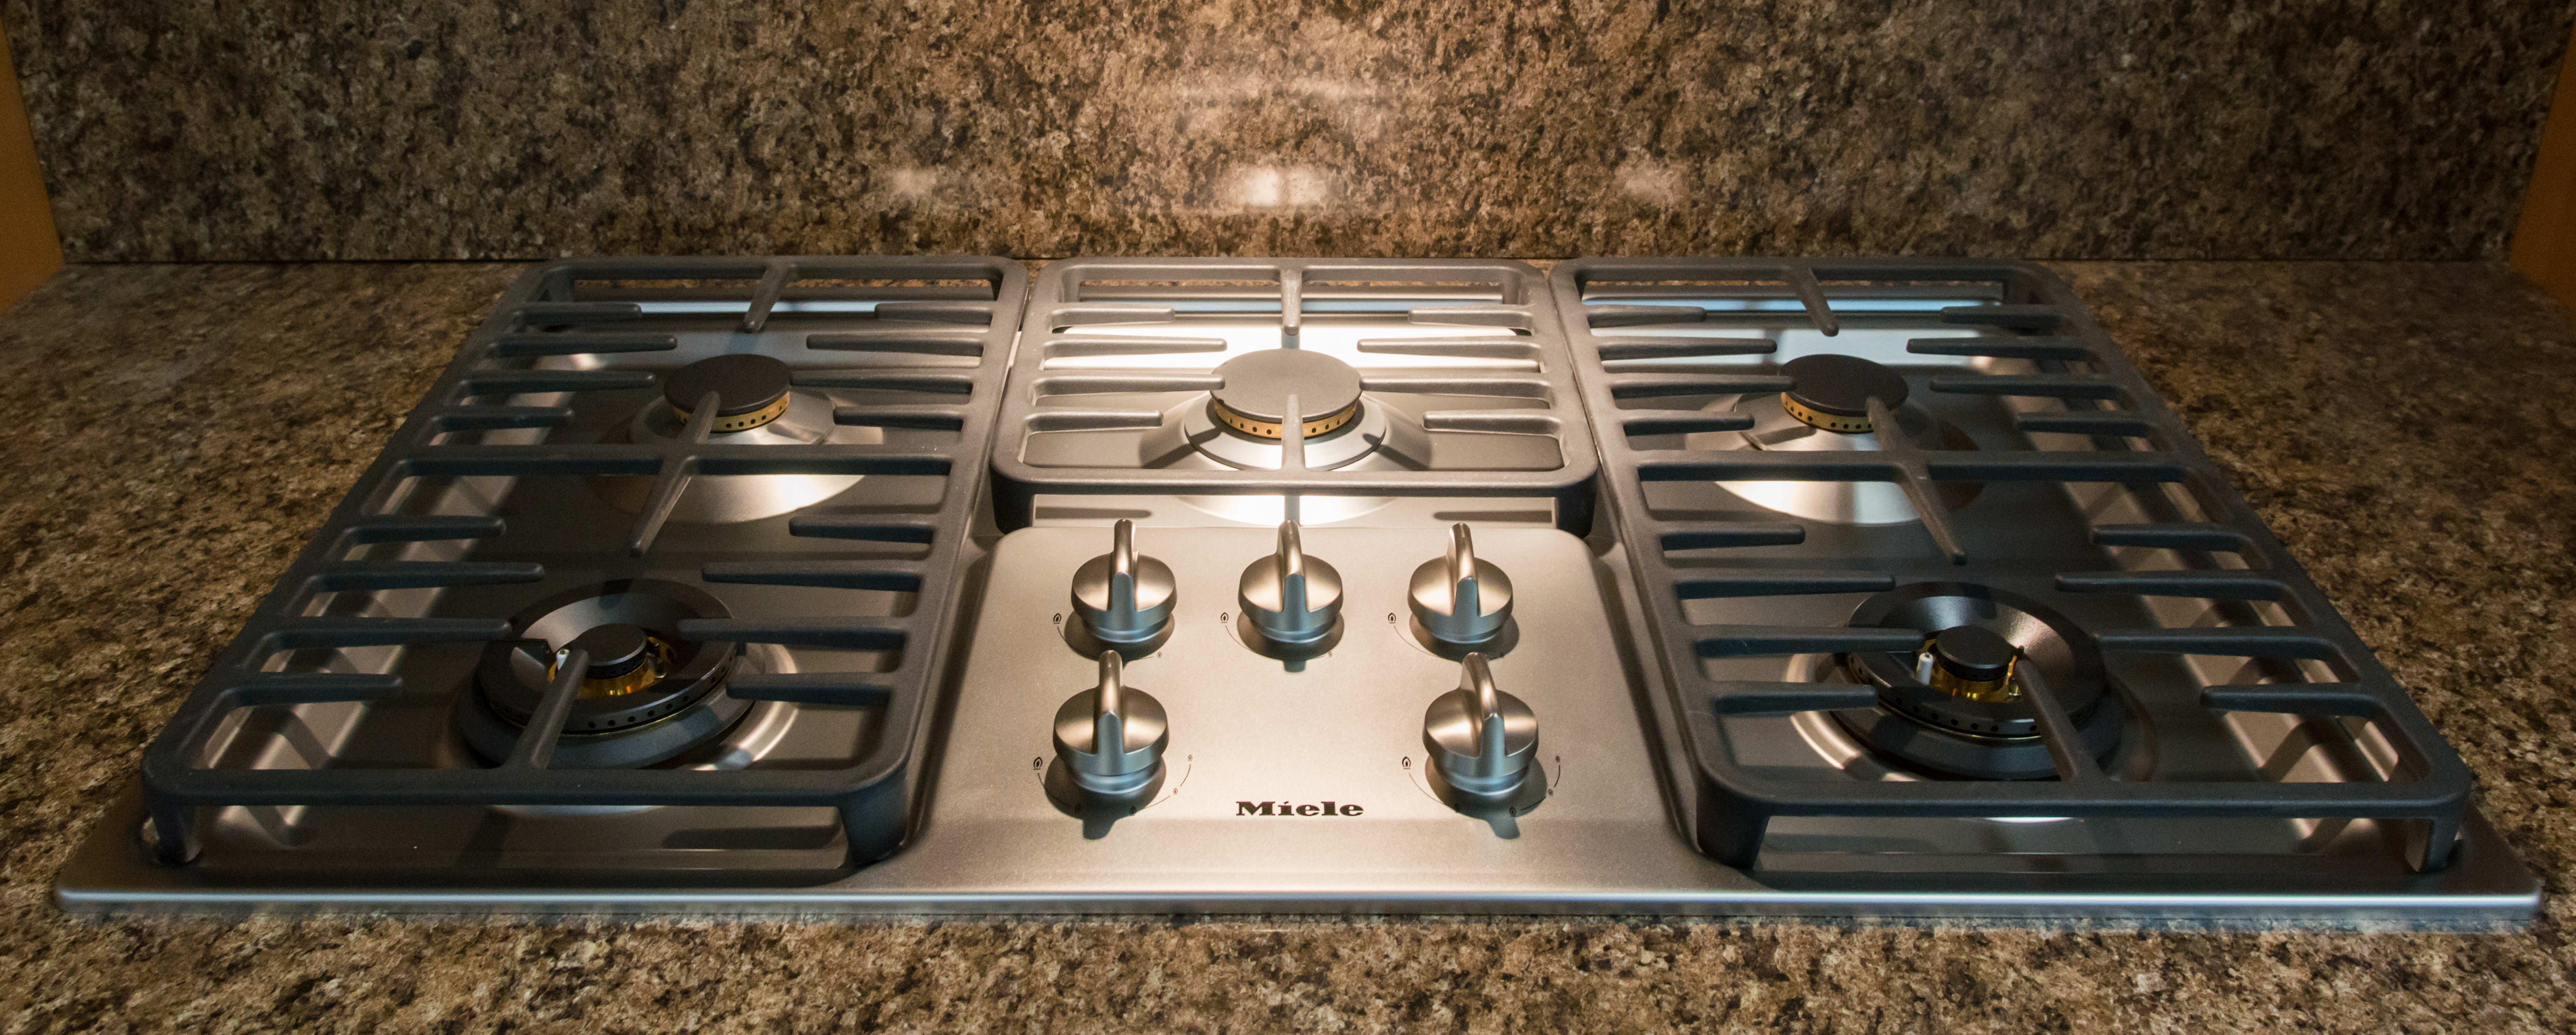 cooktop, controls, and grates